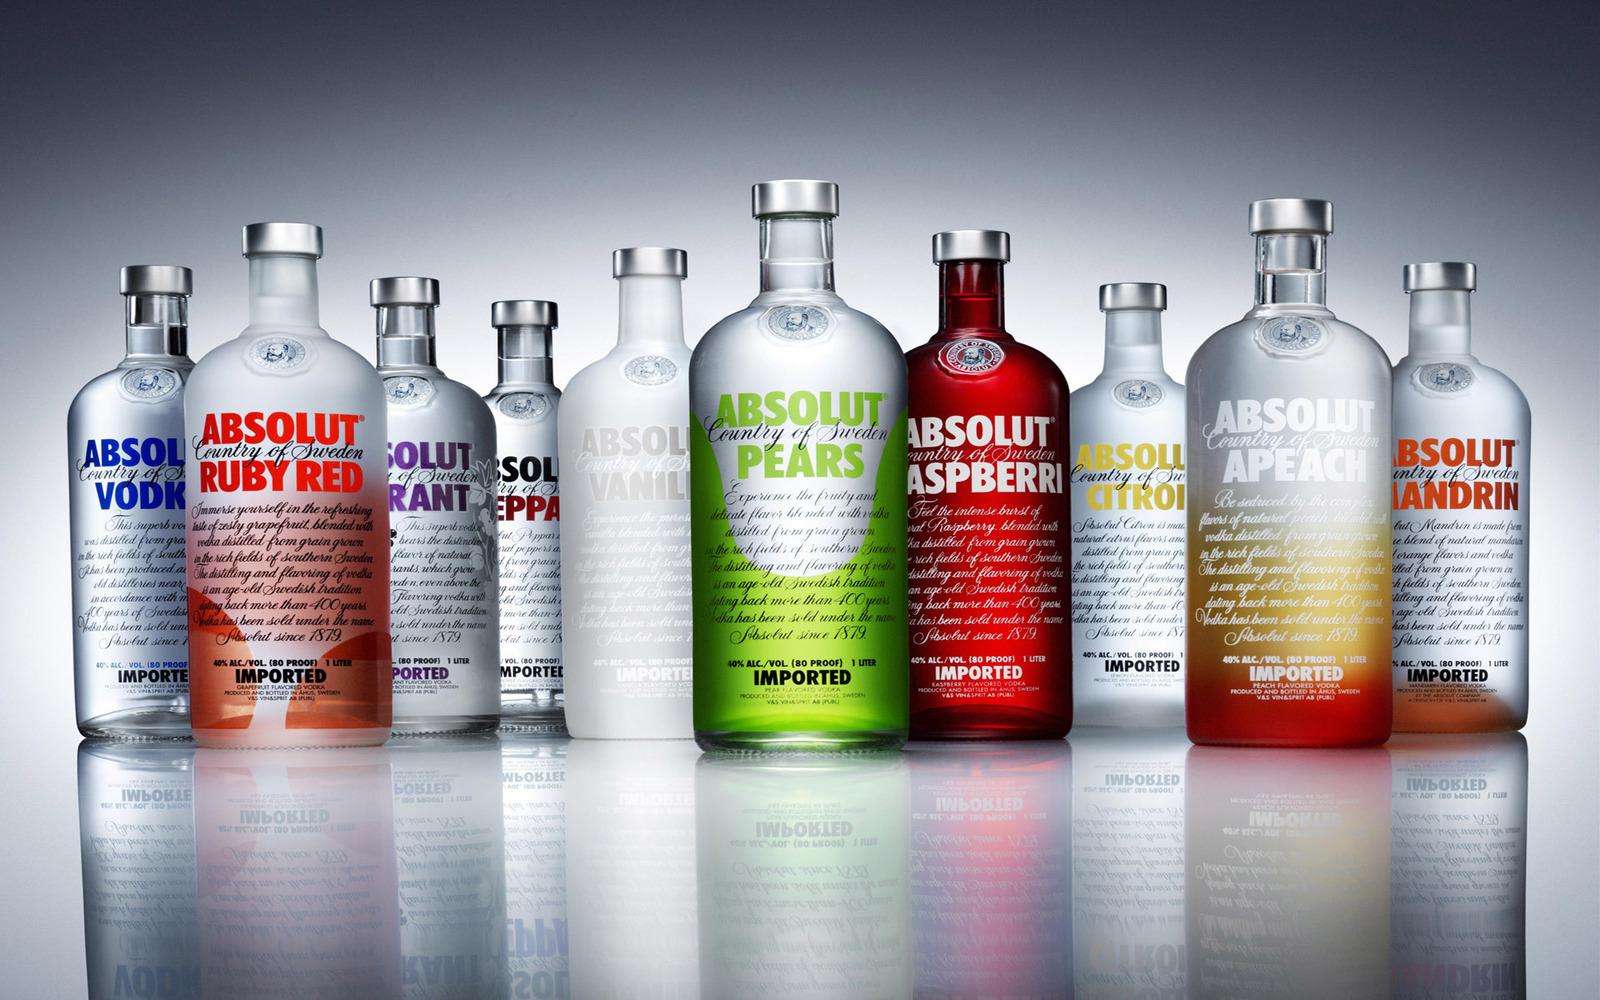 Top 10 Vodka Brands In The World